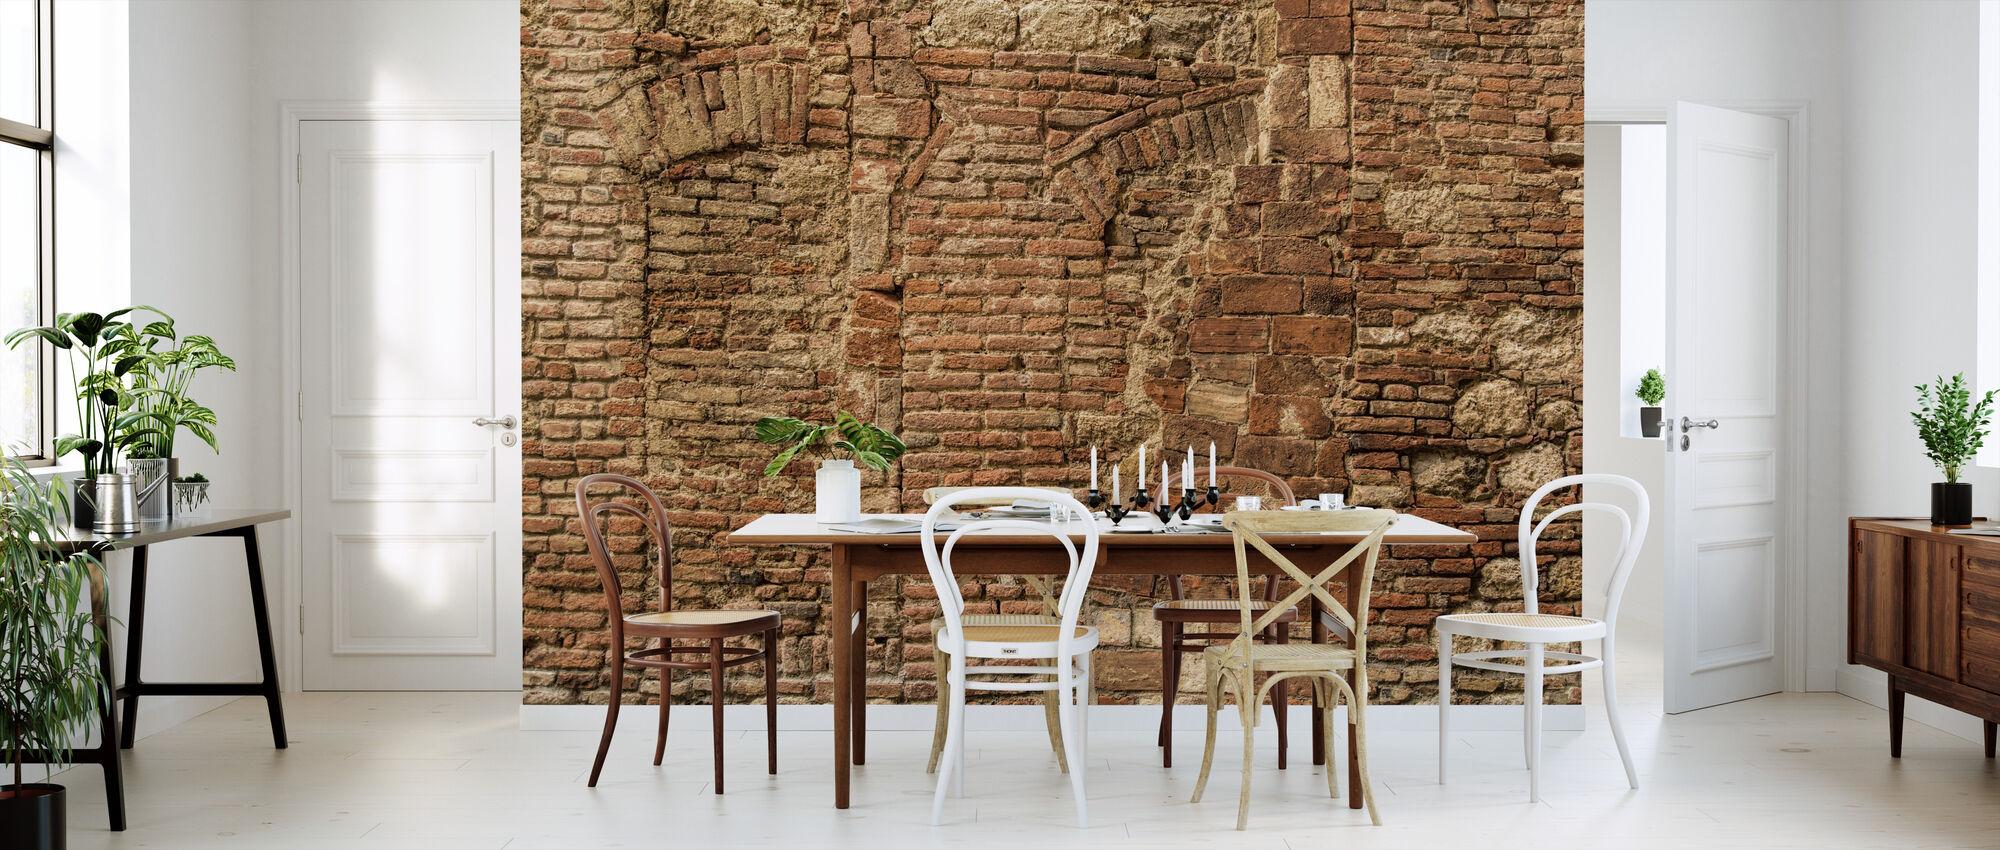 Italiensk stenmur - Tapet - Kök